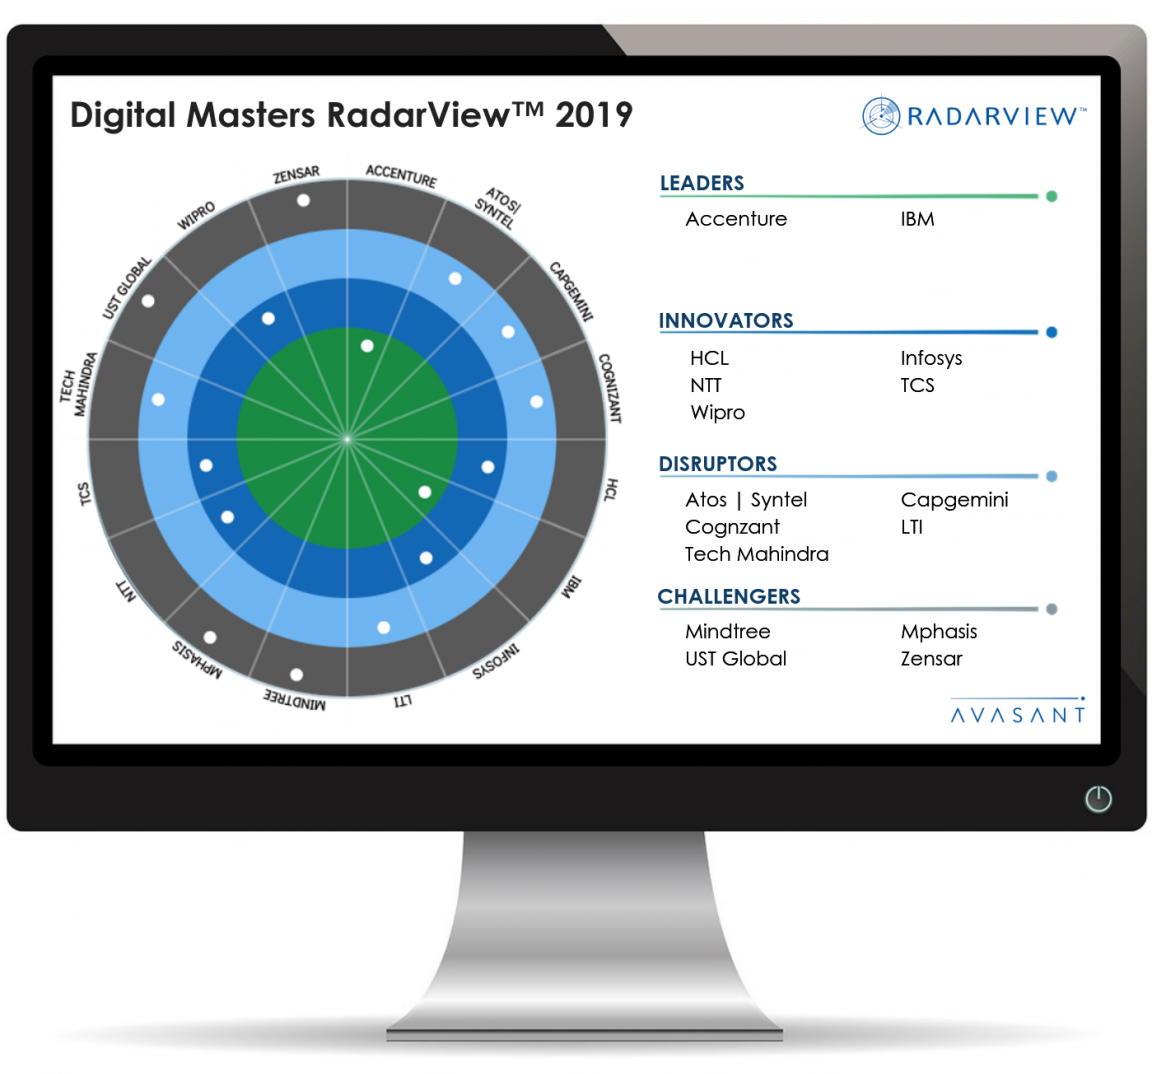 Digital Masters 1 e1591111179970 - Digital Masters RadarView™ 2019